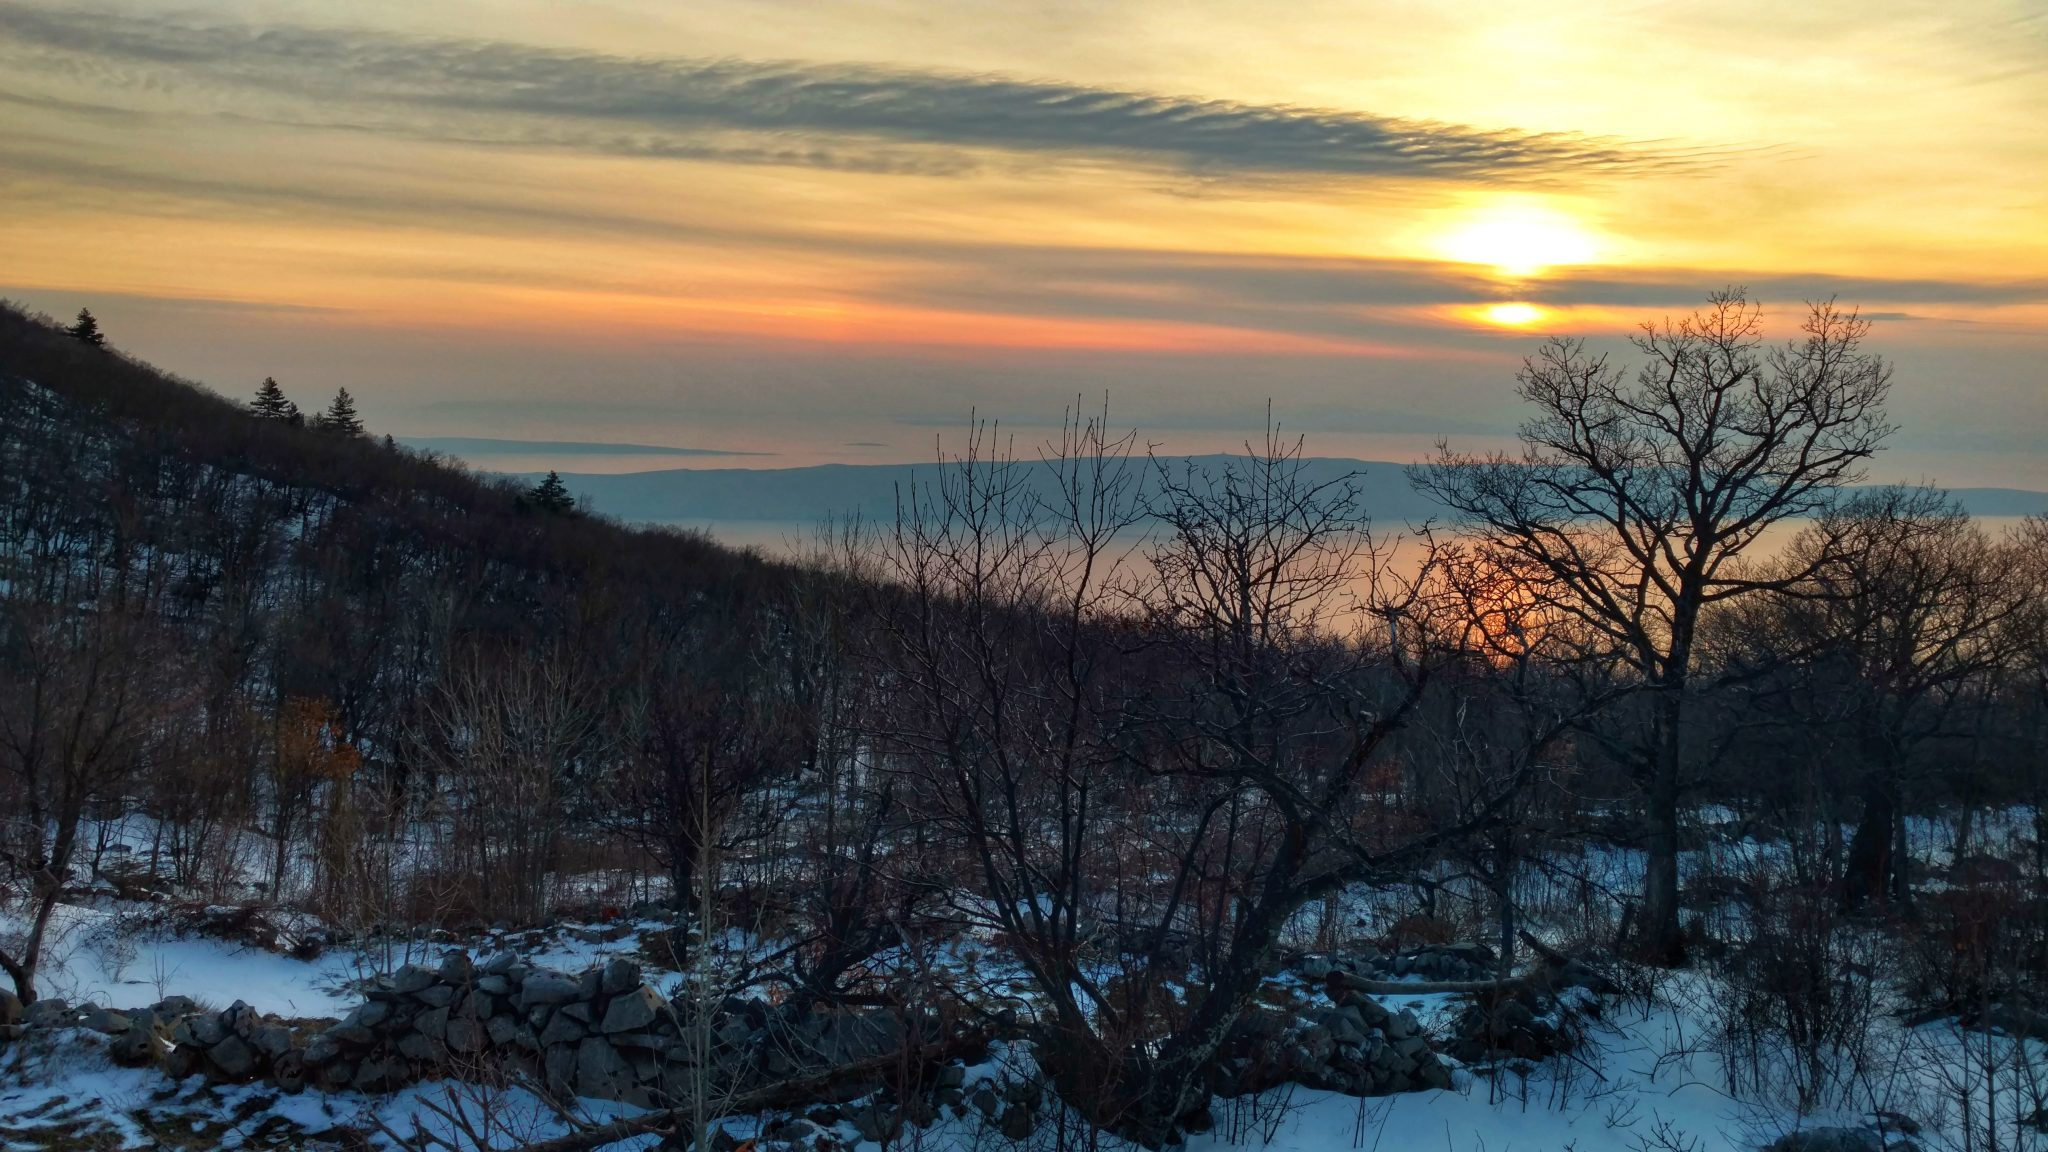 Velebit Winter Hike Day 1 | Bivouac